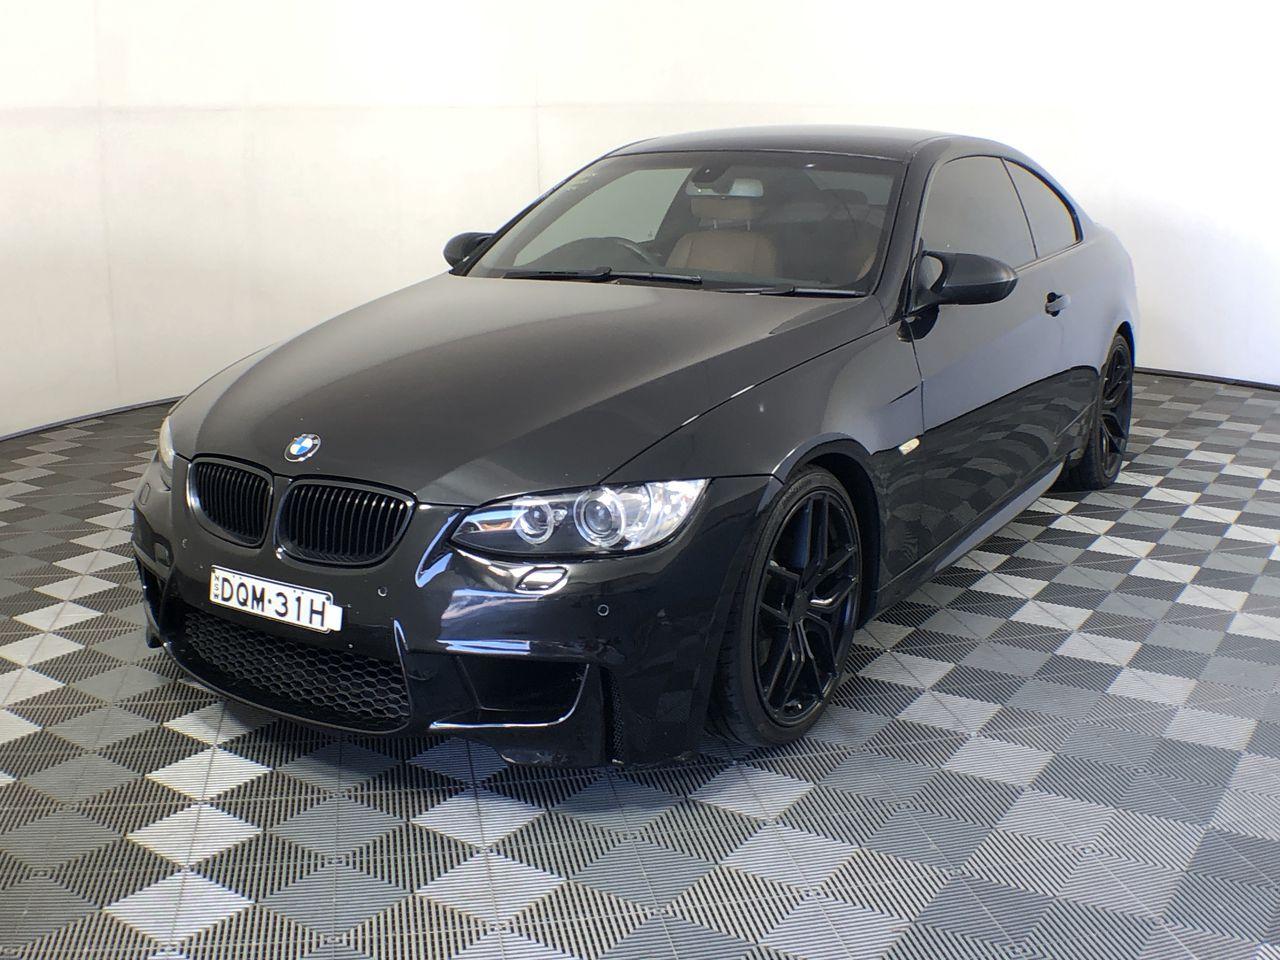 2008 BMW 325i Manual Coupe 99,643km